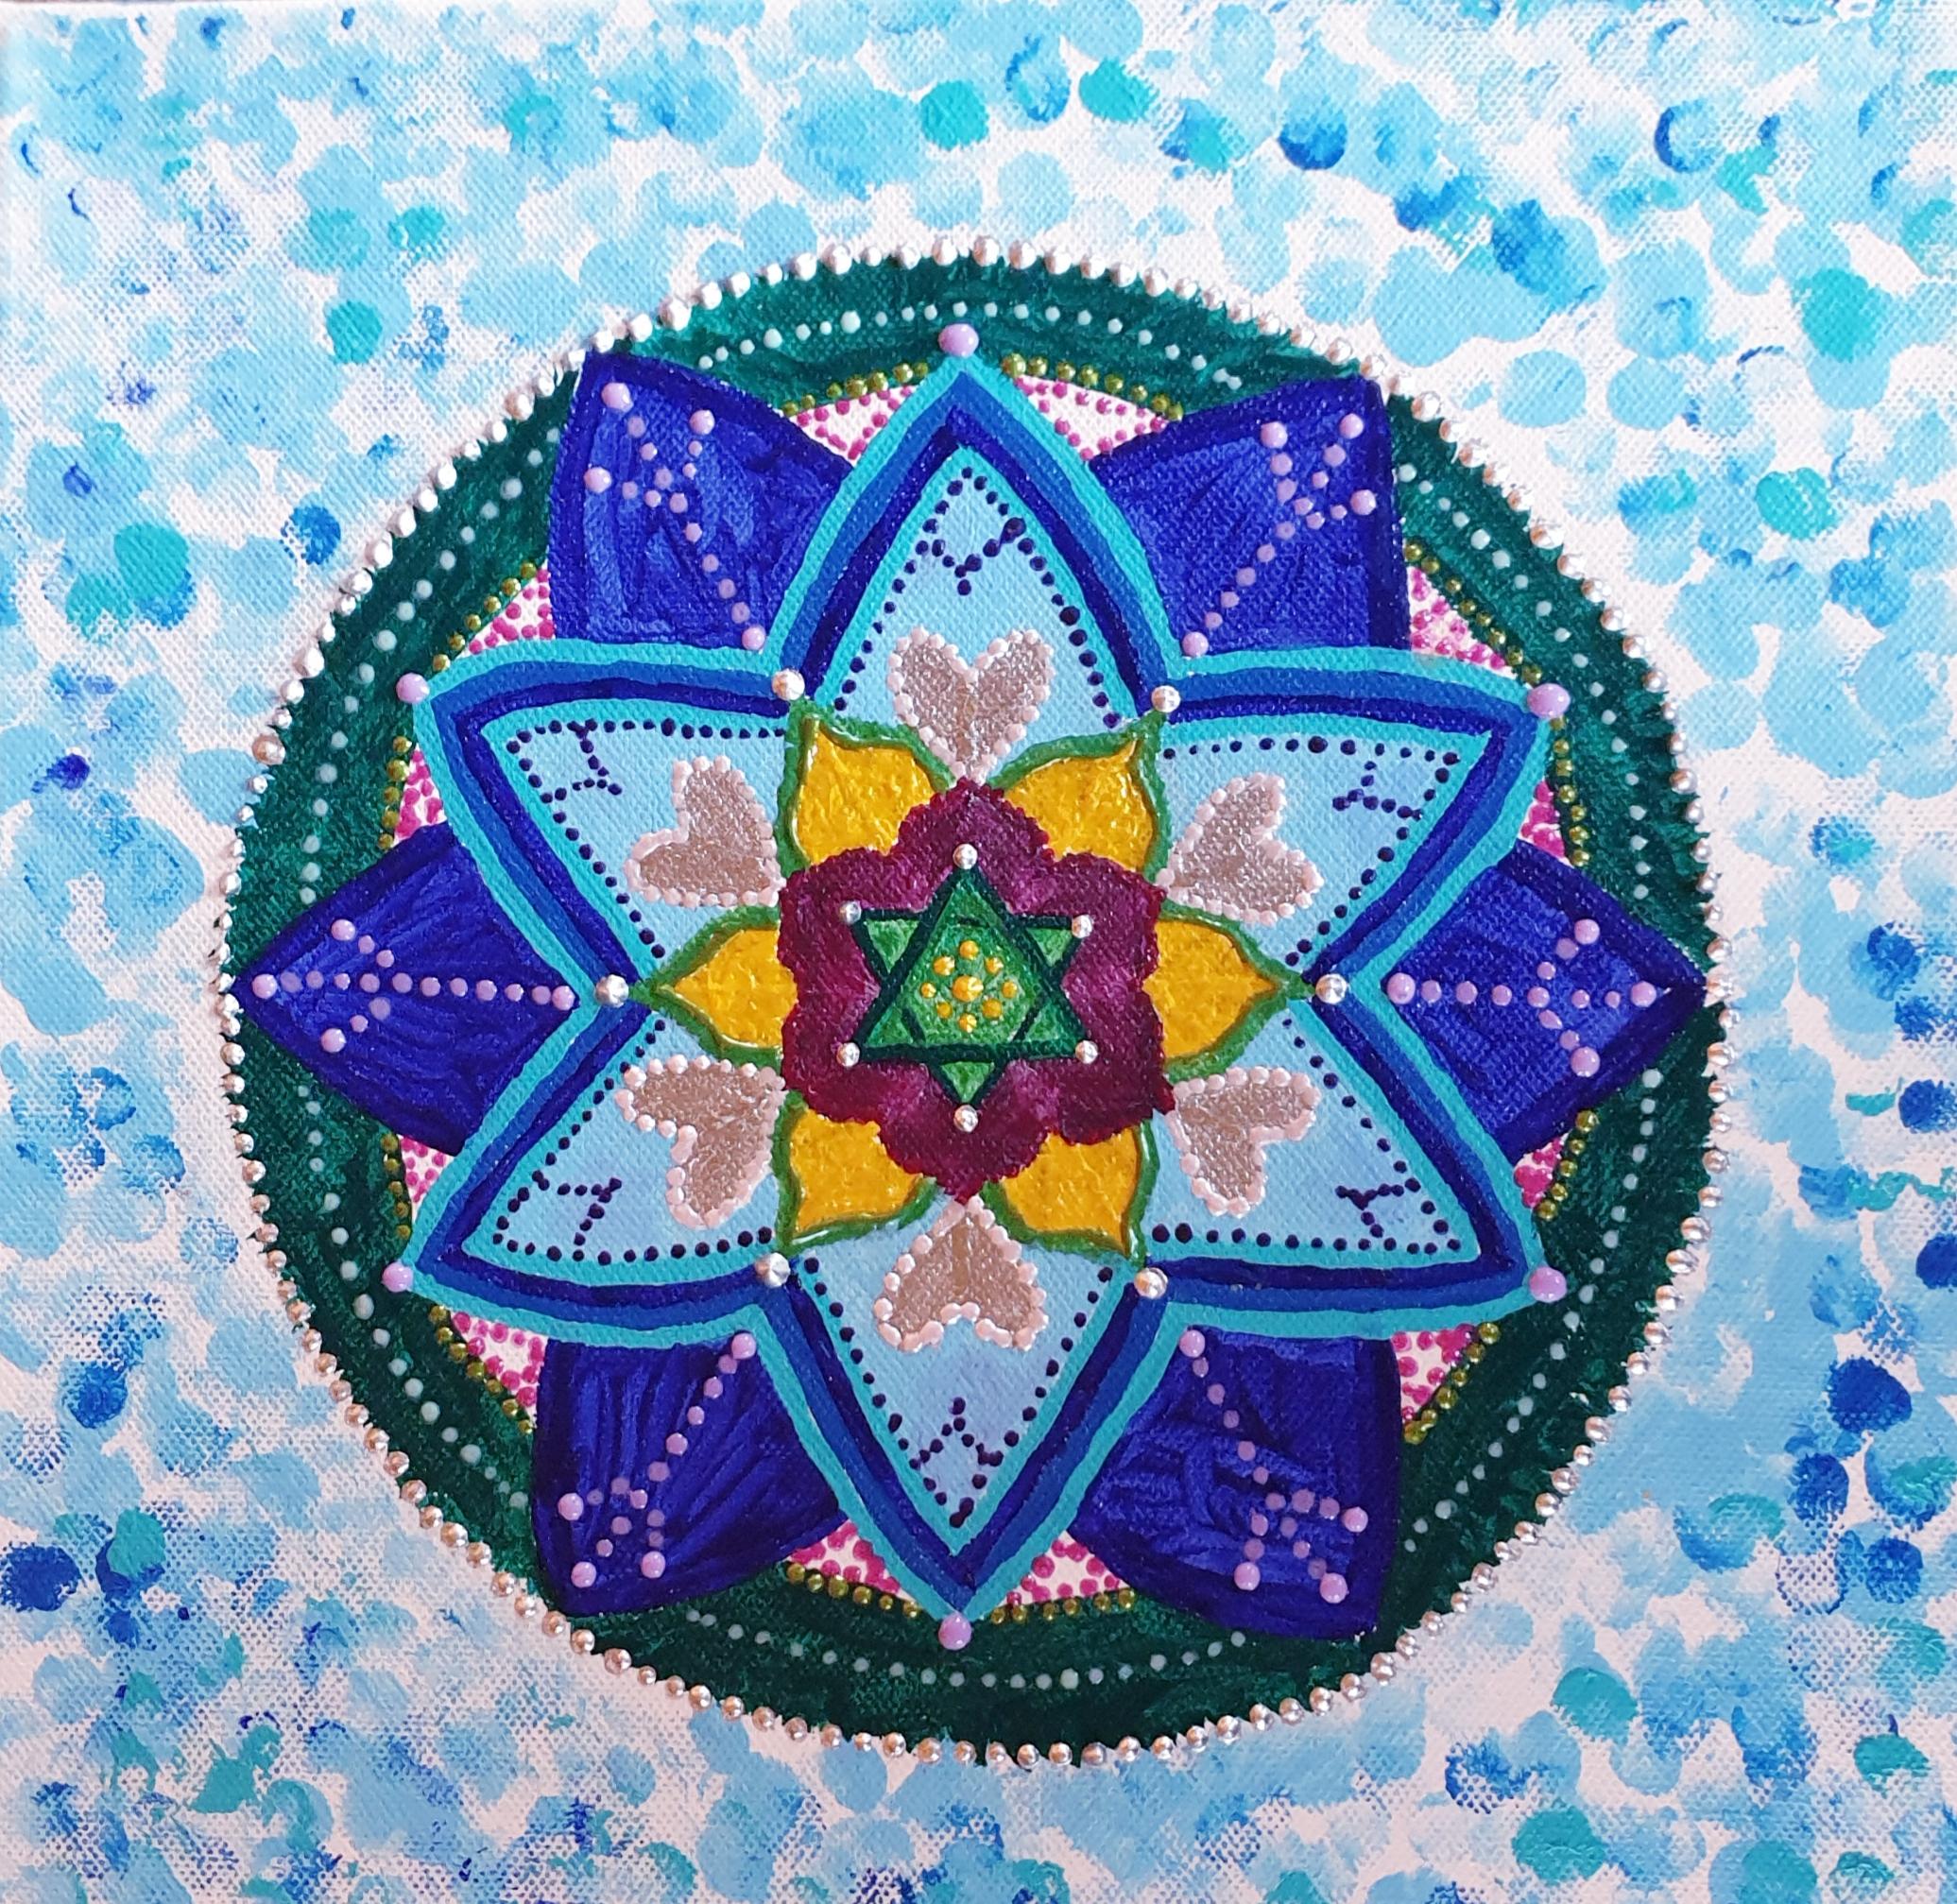 "Obraz akryl 30cm x 30cm pt. ""Mandala spokoju"" (2019)"